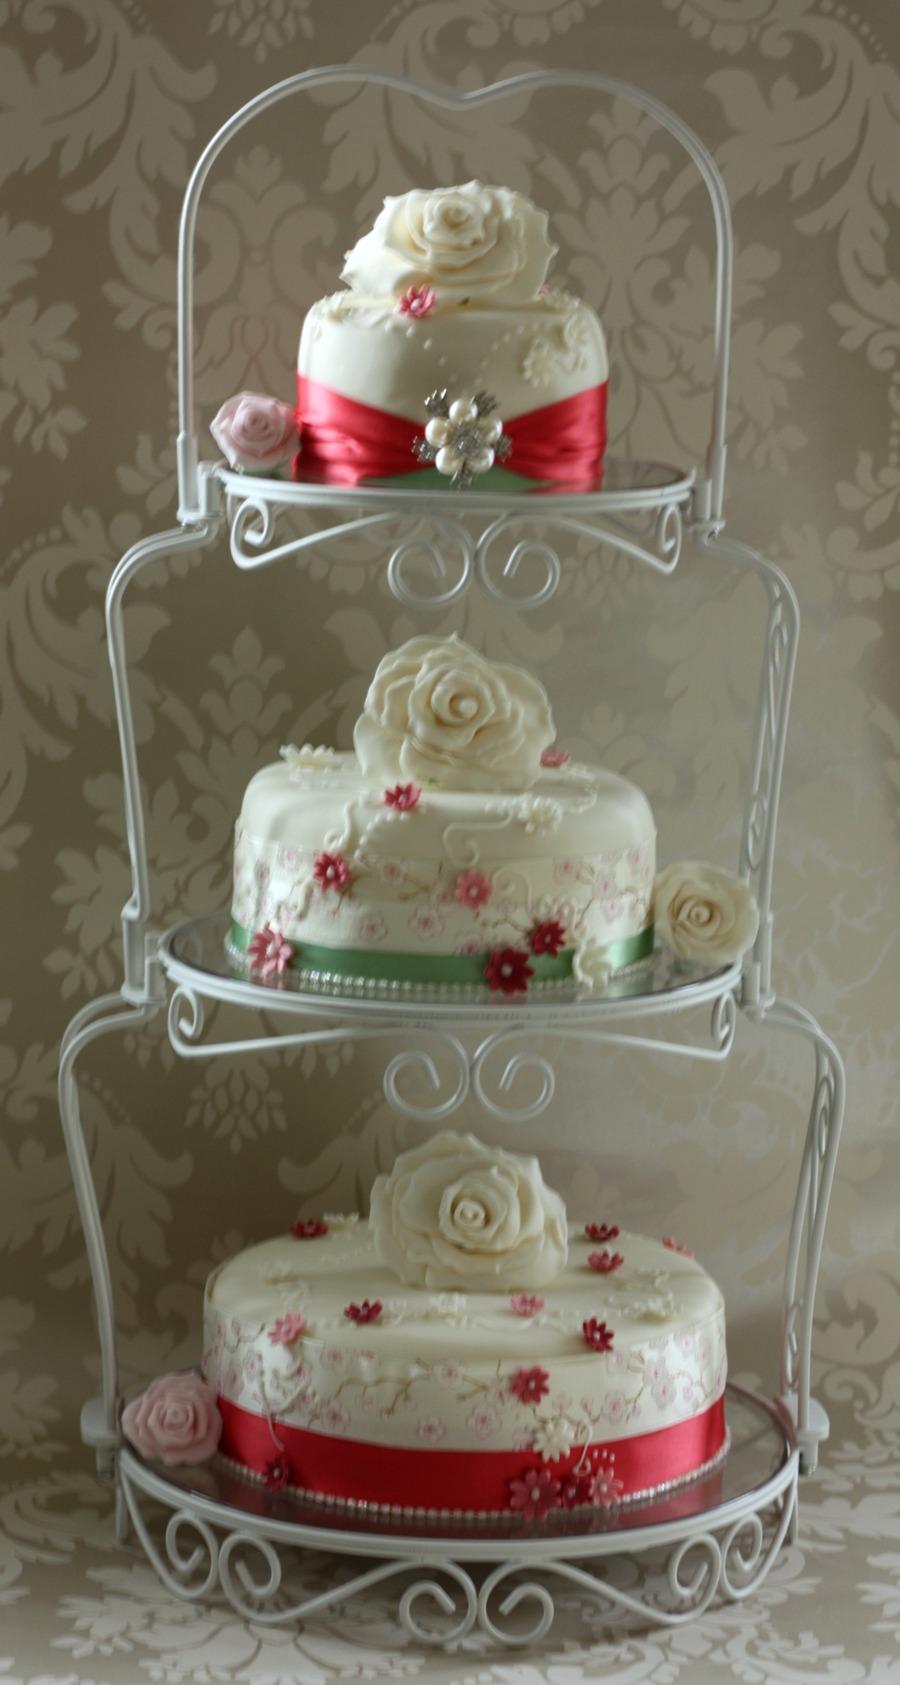 Vintage Style Wedding Cake On Graceful Tiers Stand Watermelon Wallpaper Rainbow Find Free HD for Desktop [freshlhys.tk]